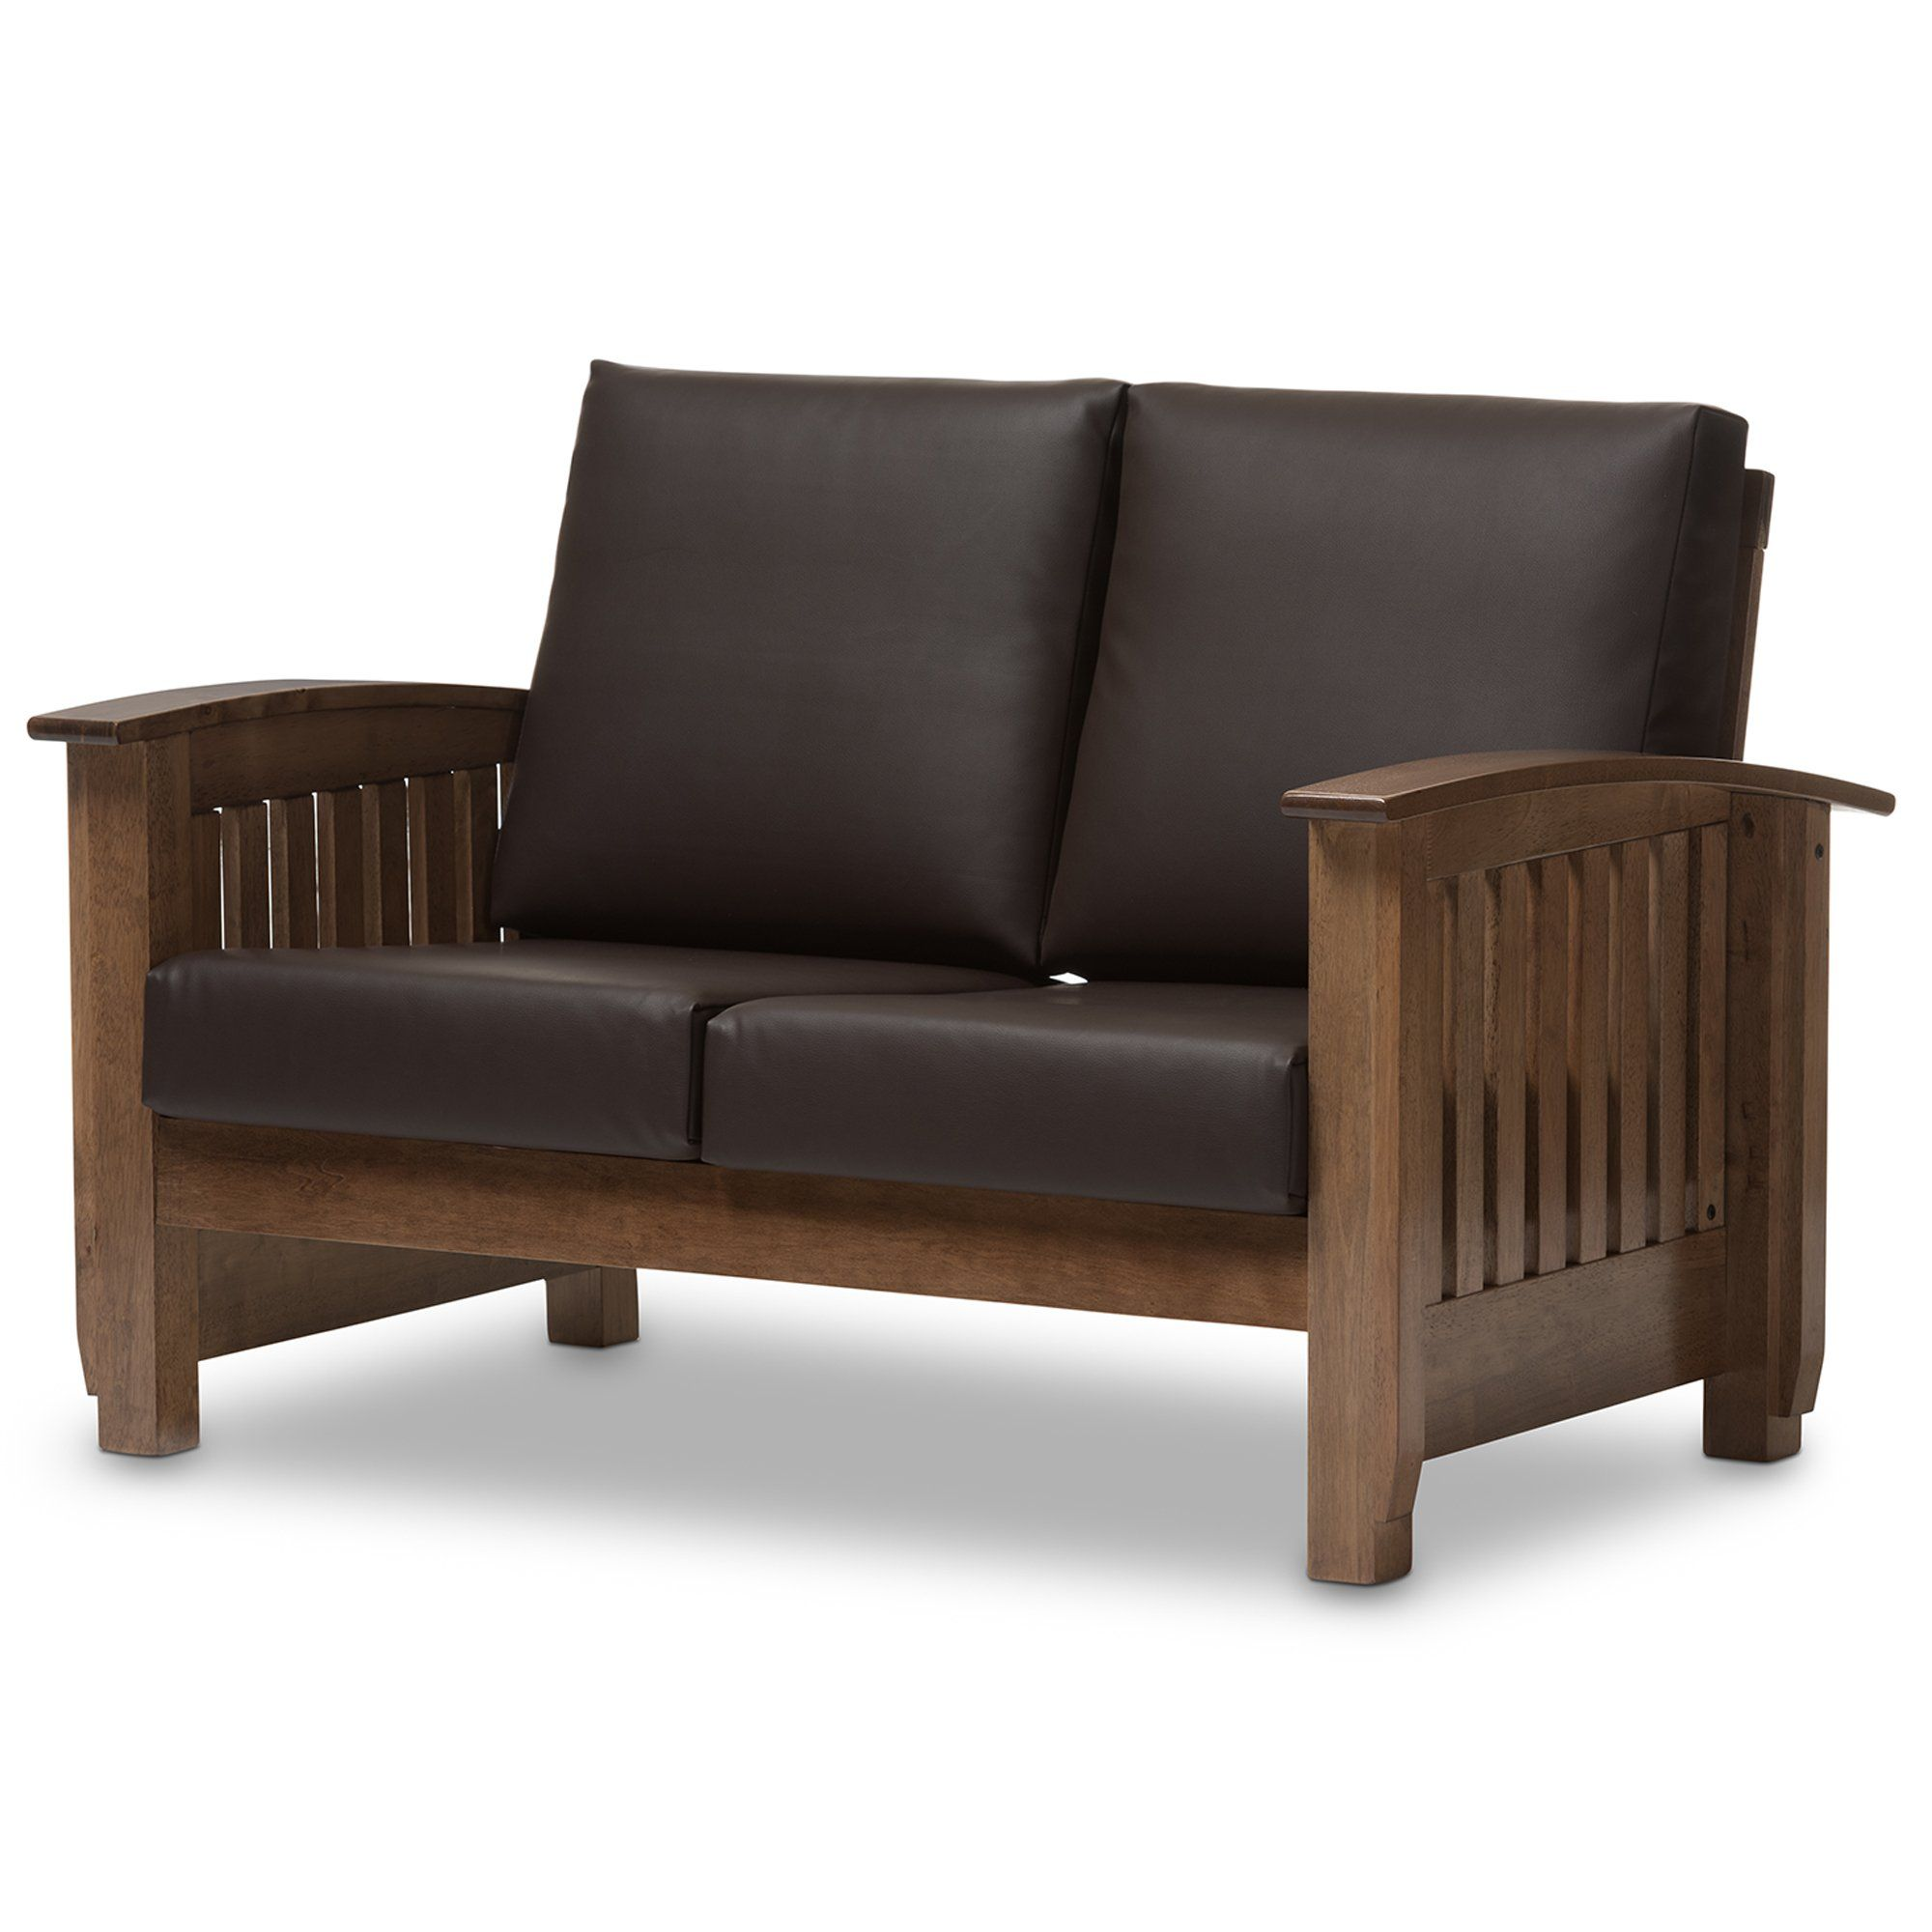 Baxton Studio Chalice Modern Classic Mission Style Walnut Wood